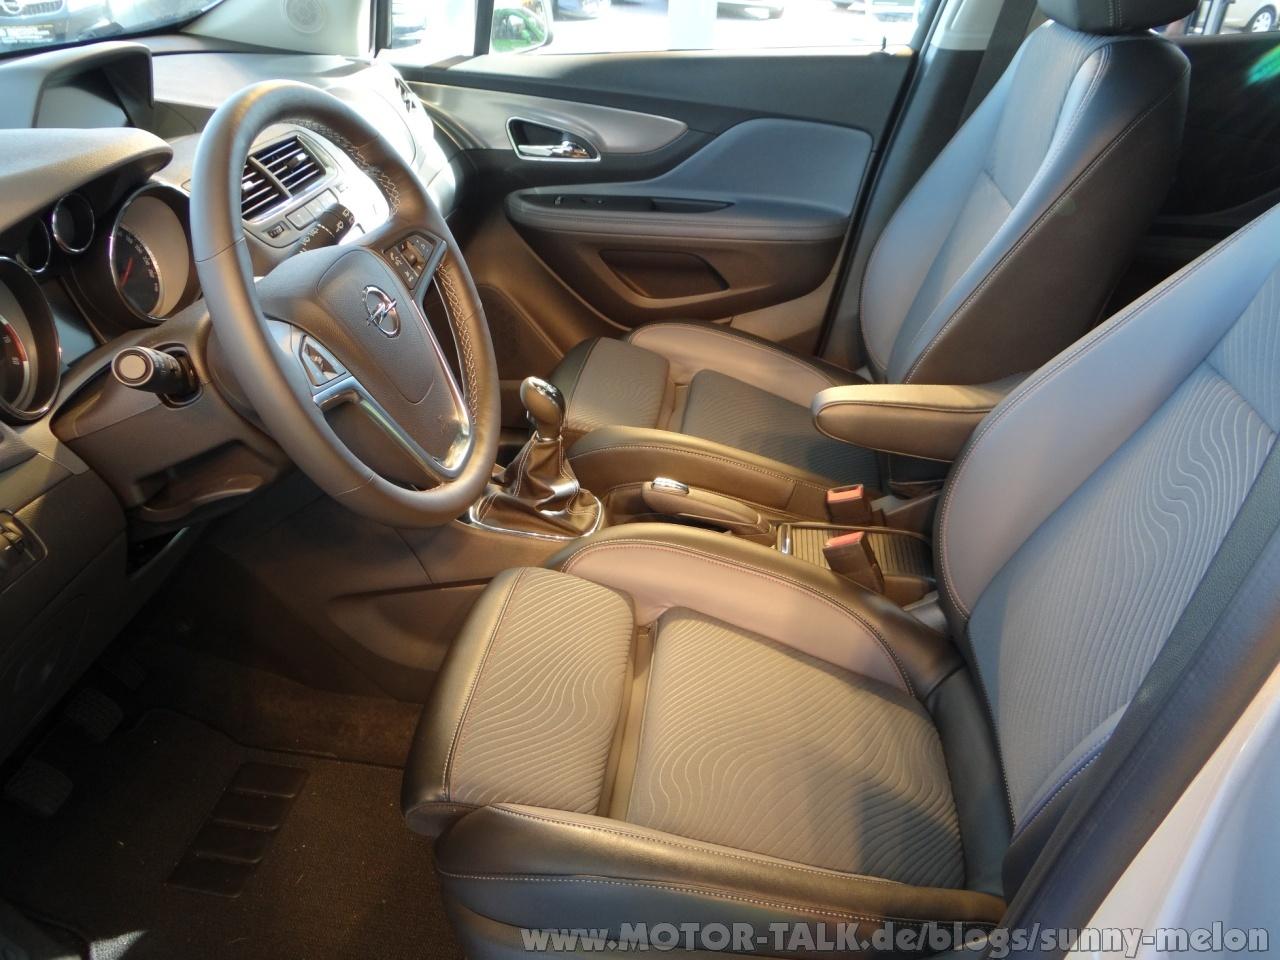 Sitzh heneinstellung beifahrersitz jetzt serienm ig for Interieur opel mokka